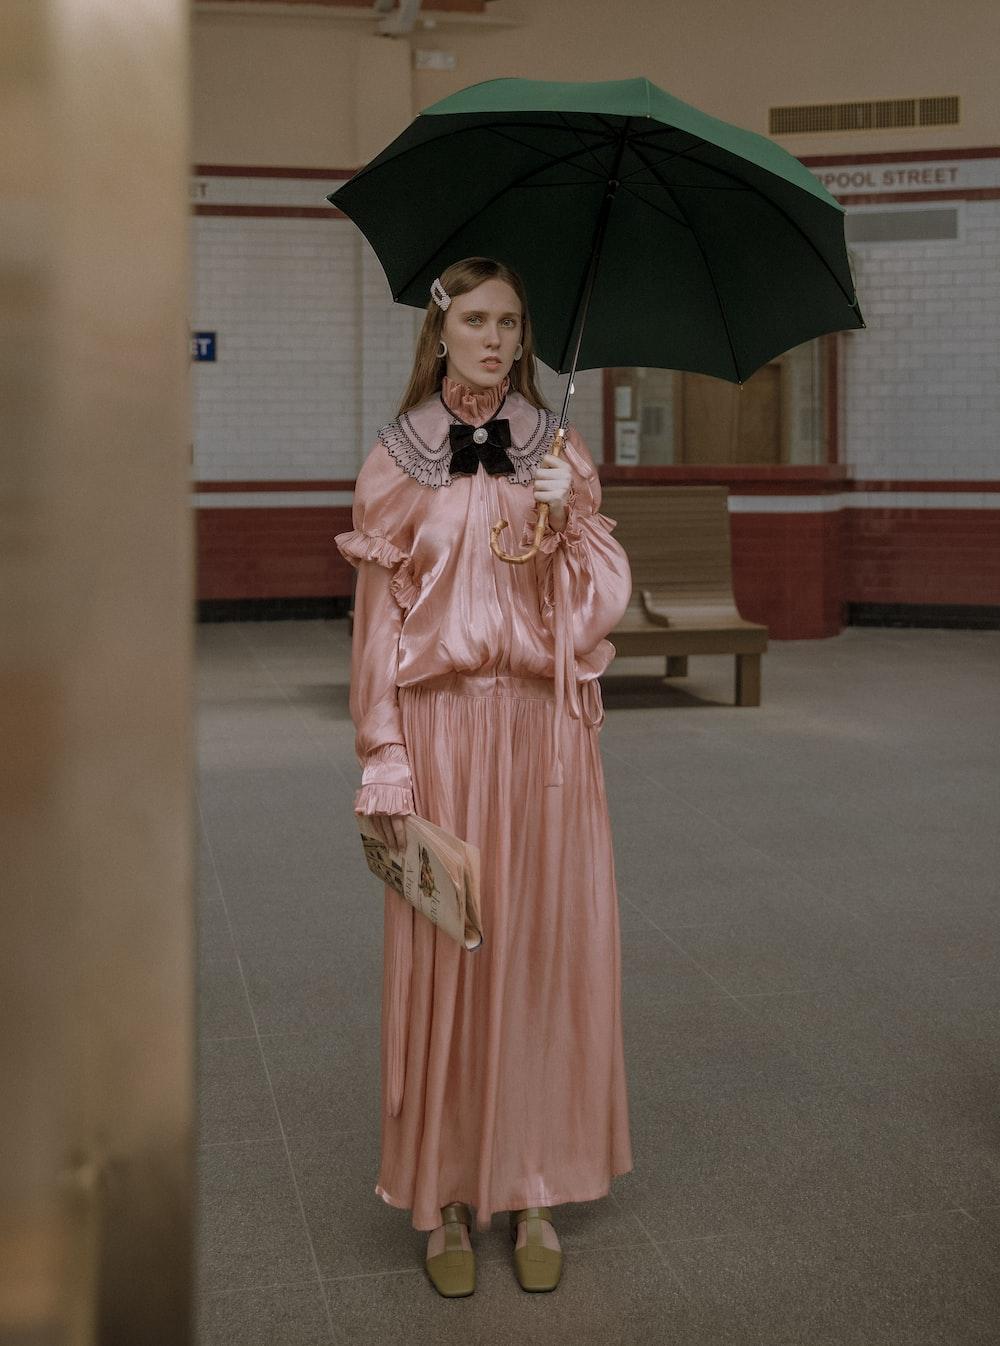 woman in pink dress under green umbrella